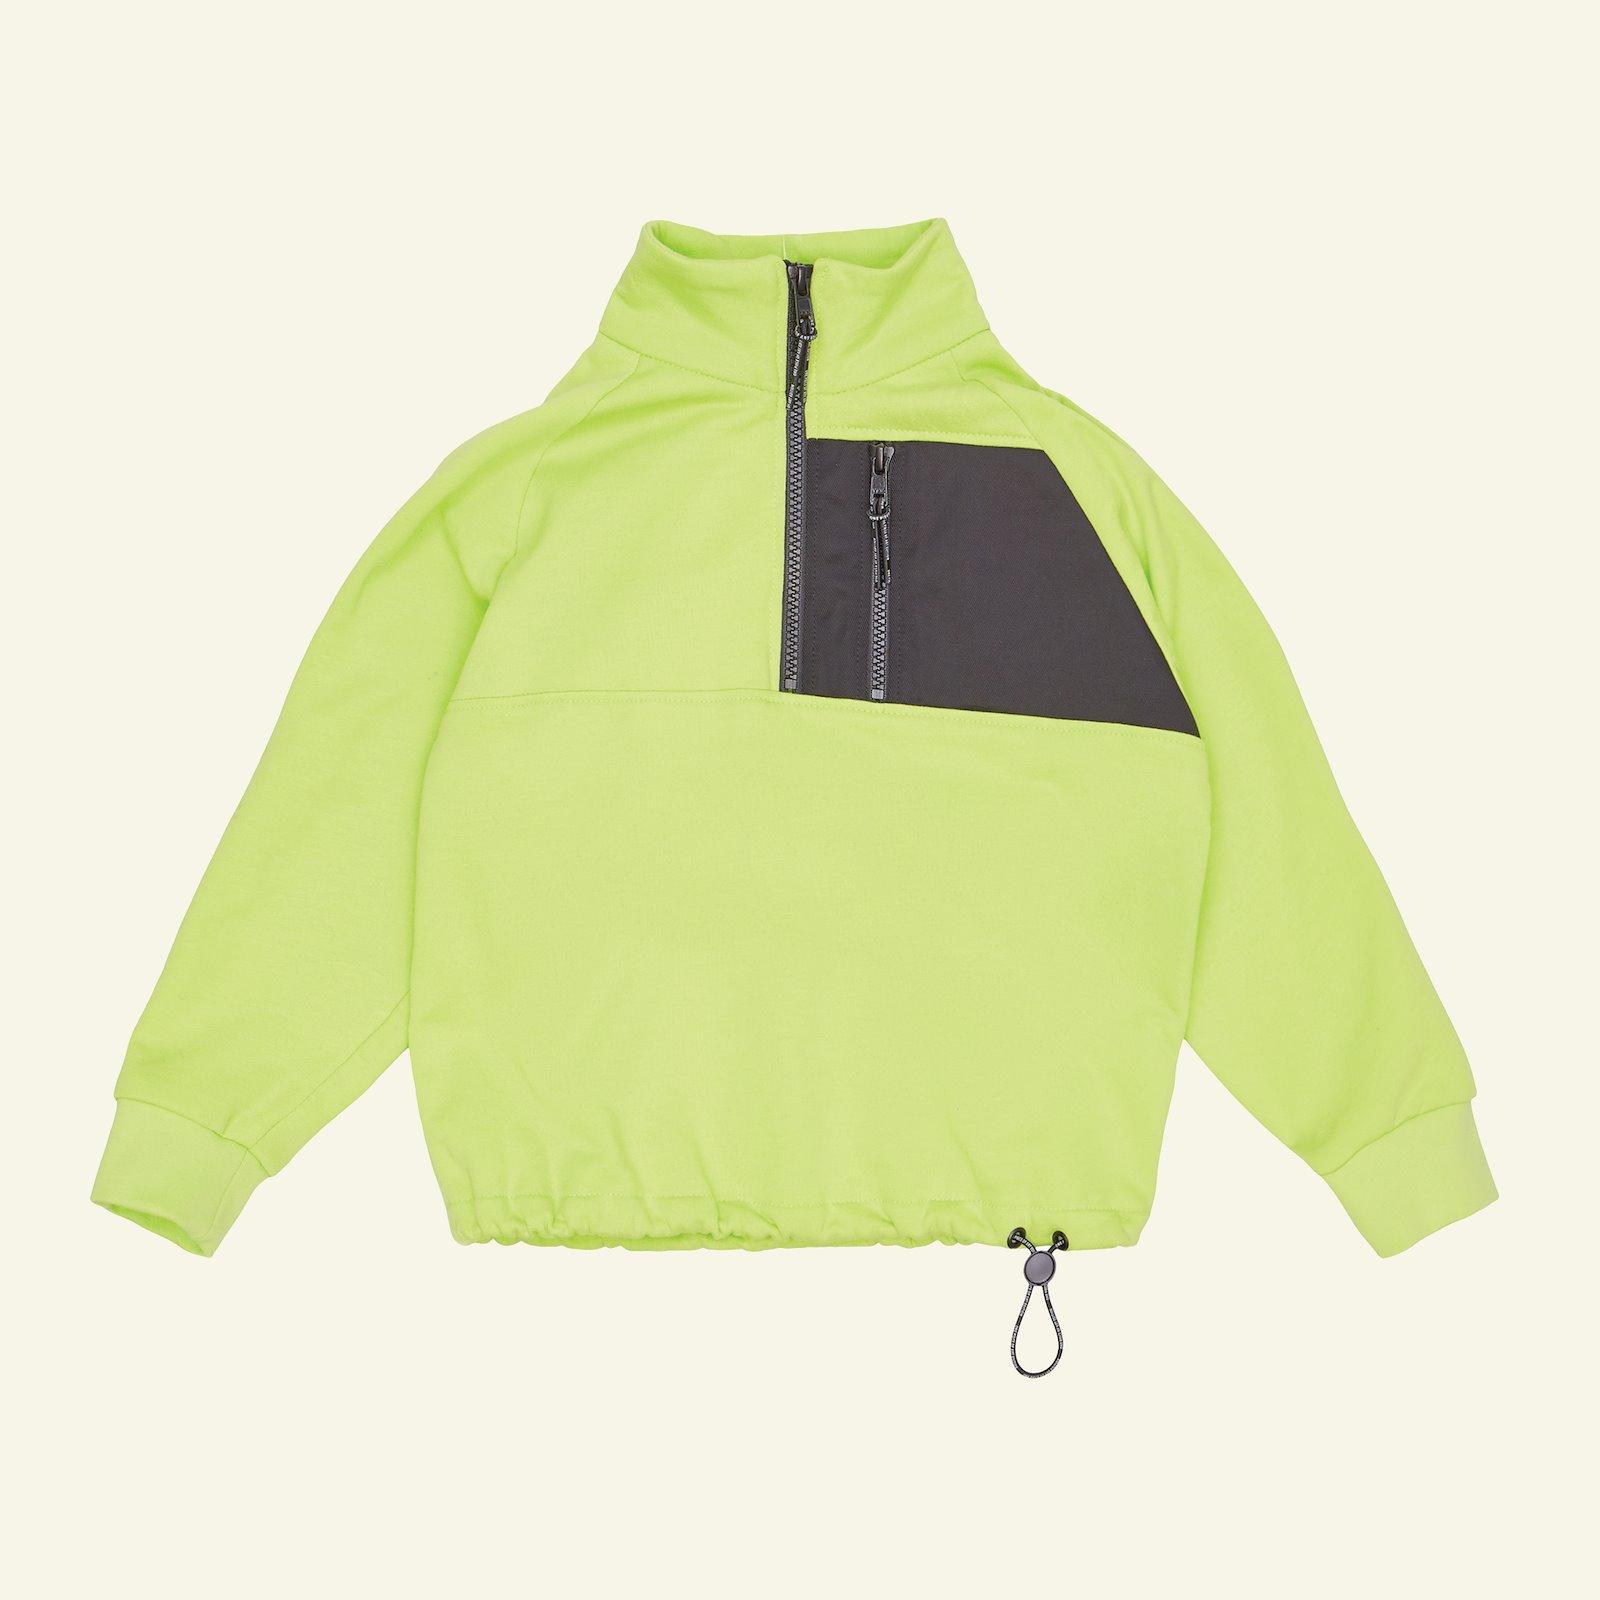 Anorak and jacket, 122/7y p64020_211770_230056_450012_sskit